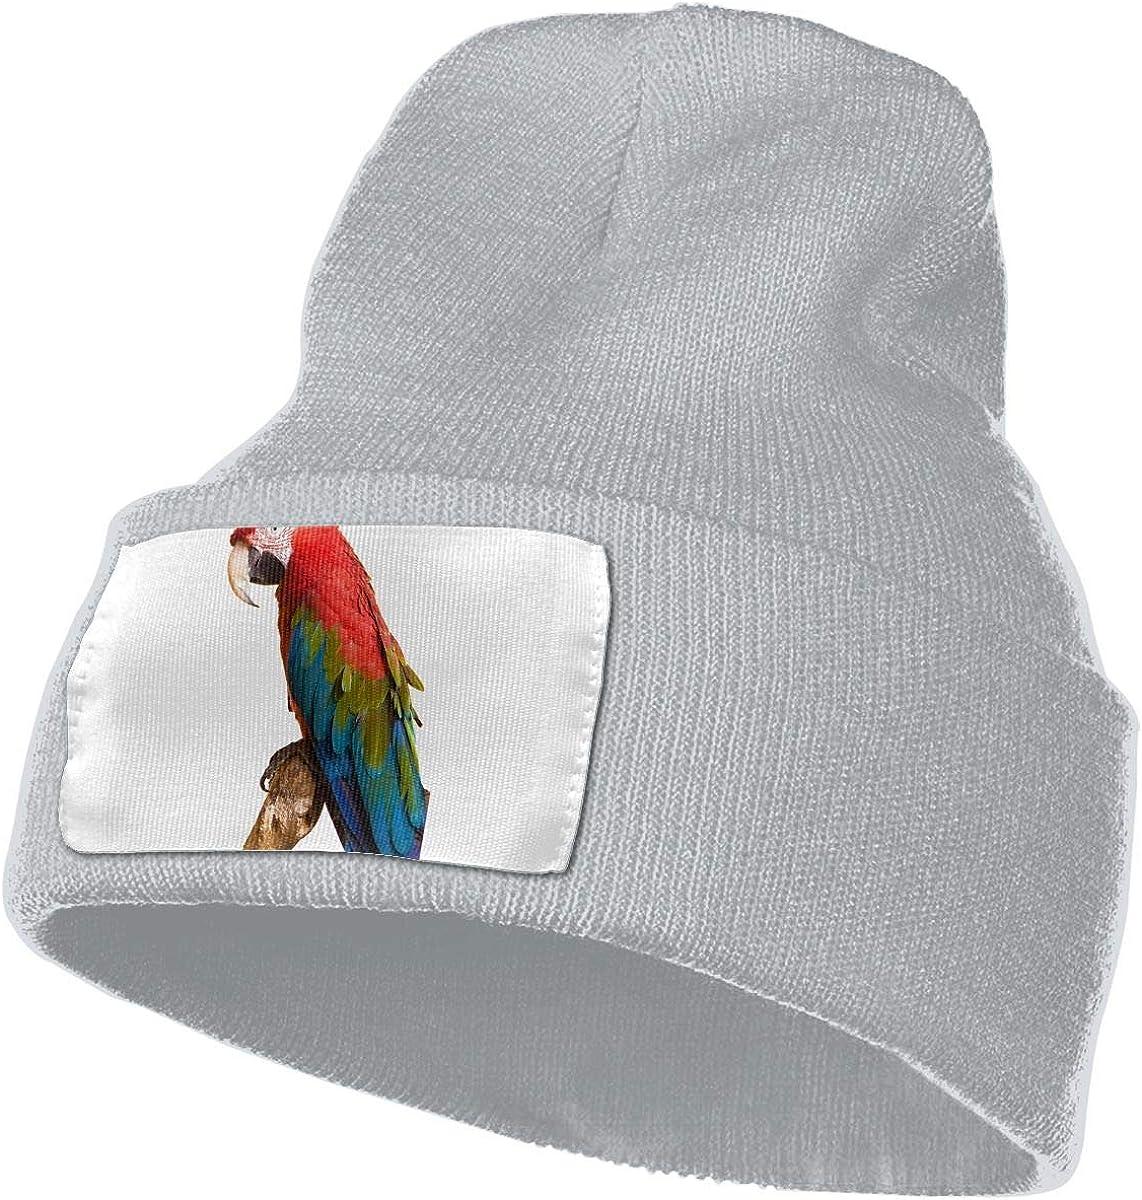 Color Parrot Unisex Fashion Knitted Hat Luxury Hip-Hop Cap